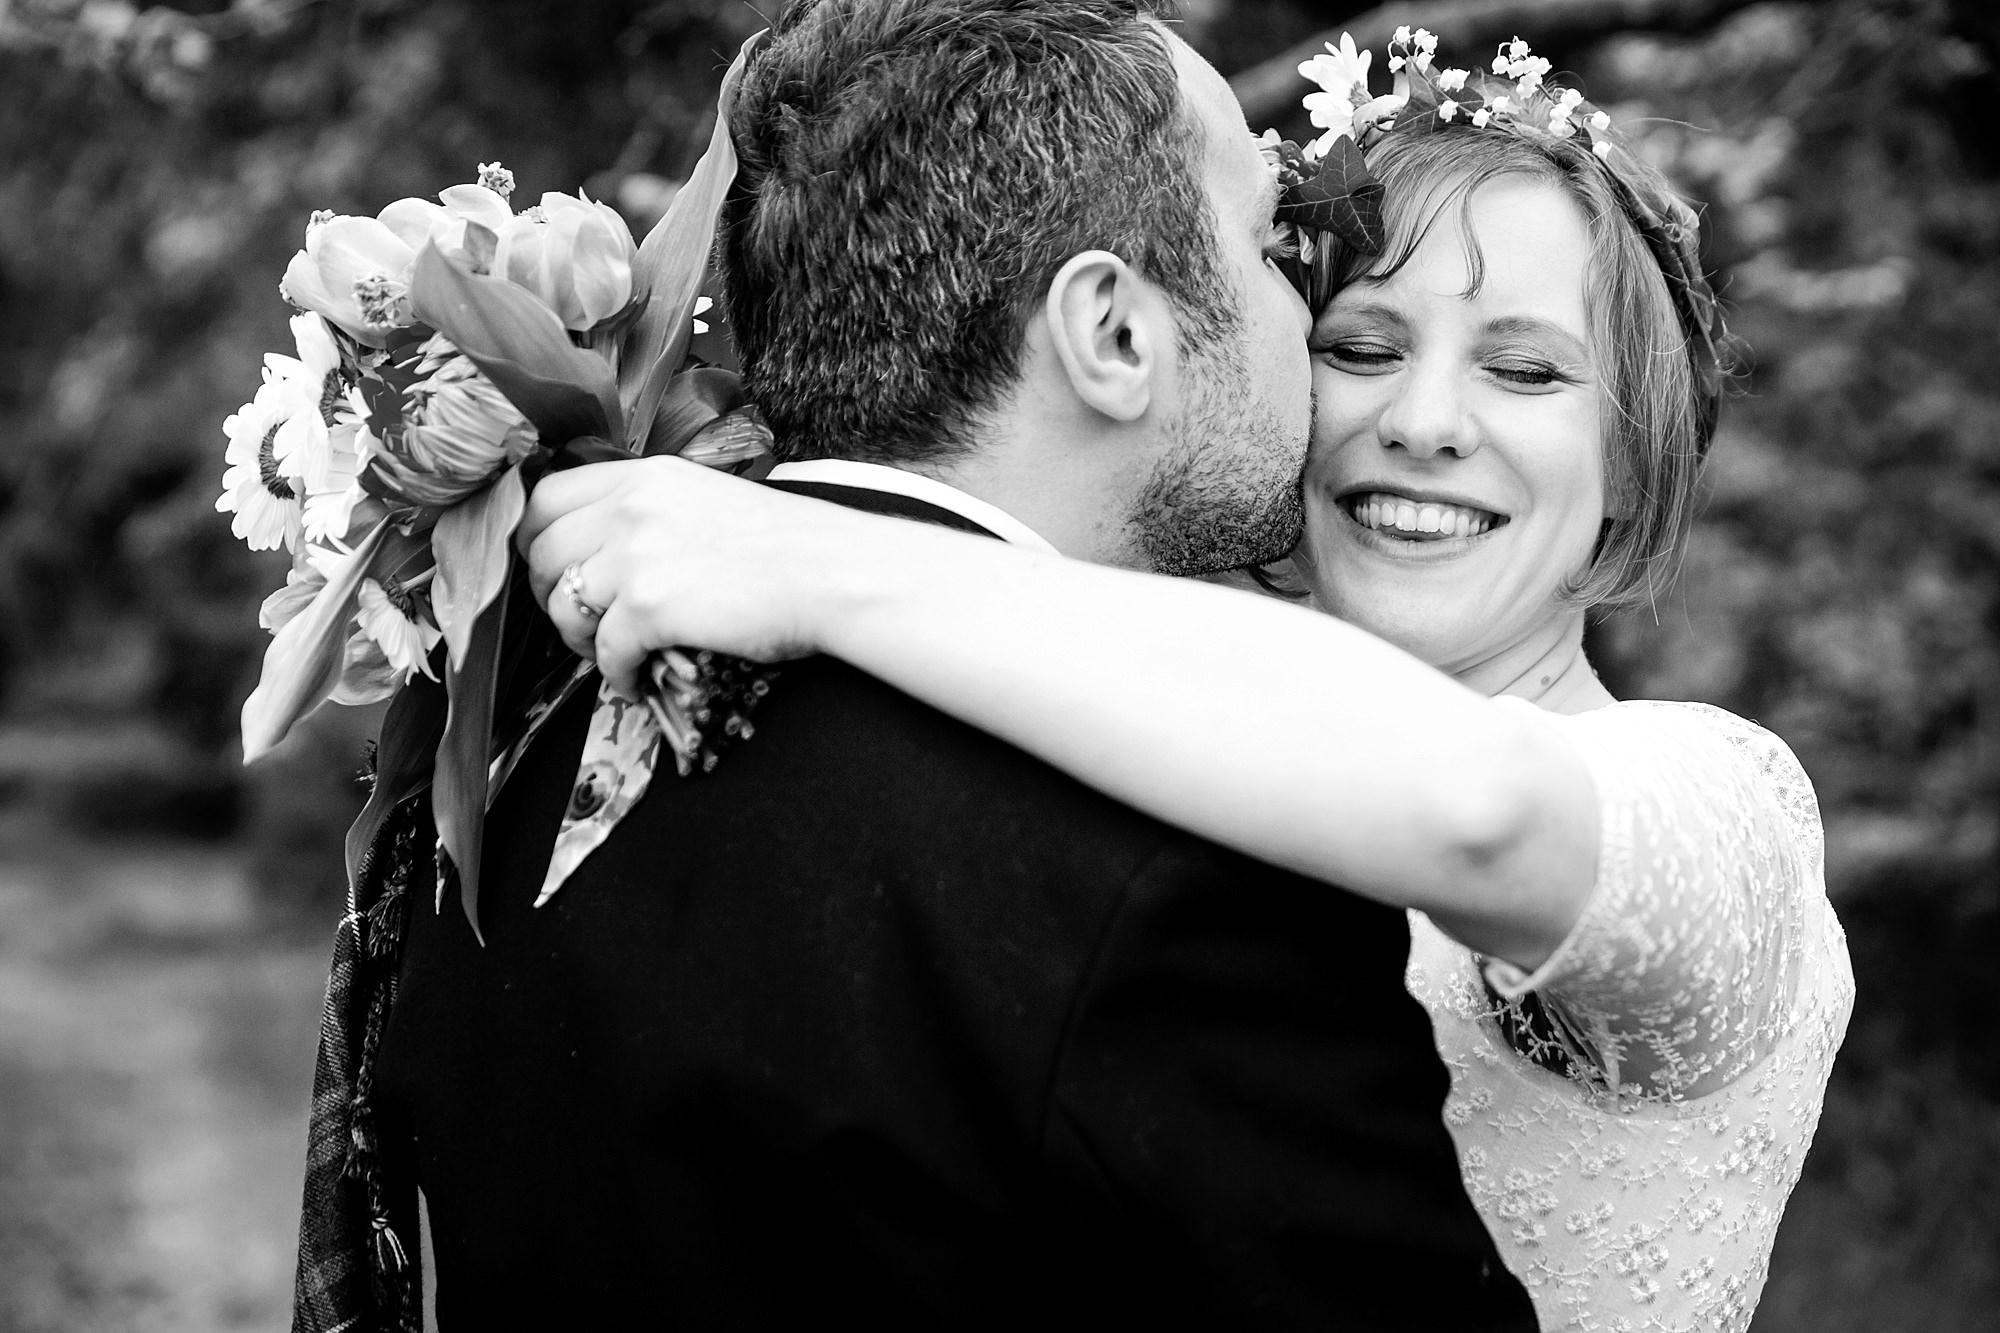 groom kissing bride on cheeks at Fun DIY wedding